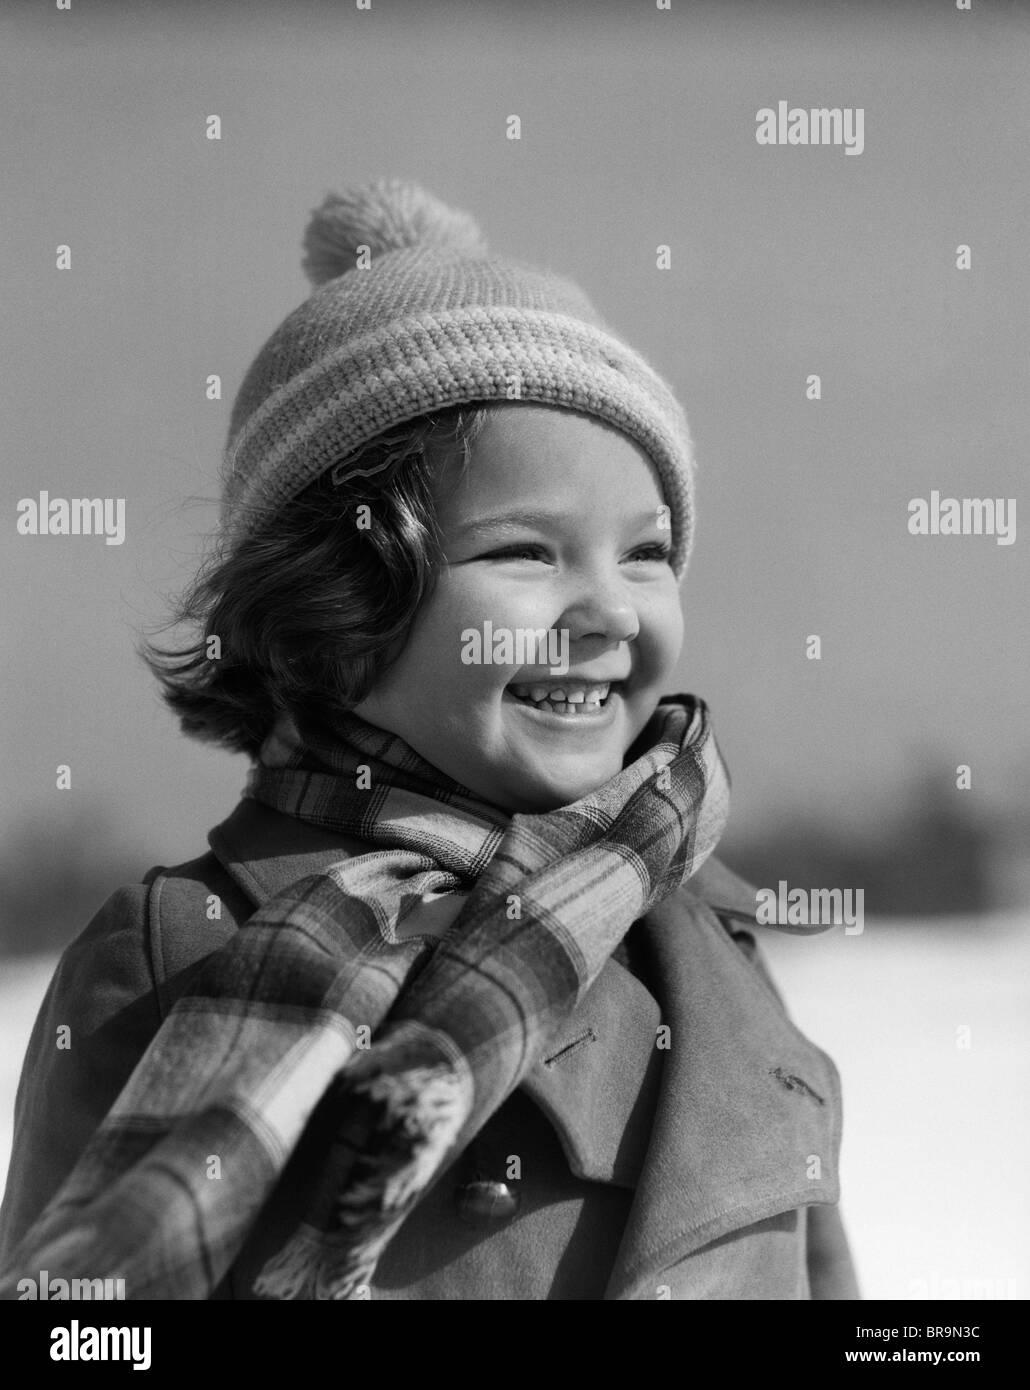 1930 SMILING LITTLE GIRL WEARING HAT VÊTEMENTS D'HIVER ROBE FOULARD Banque D'Images